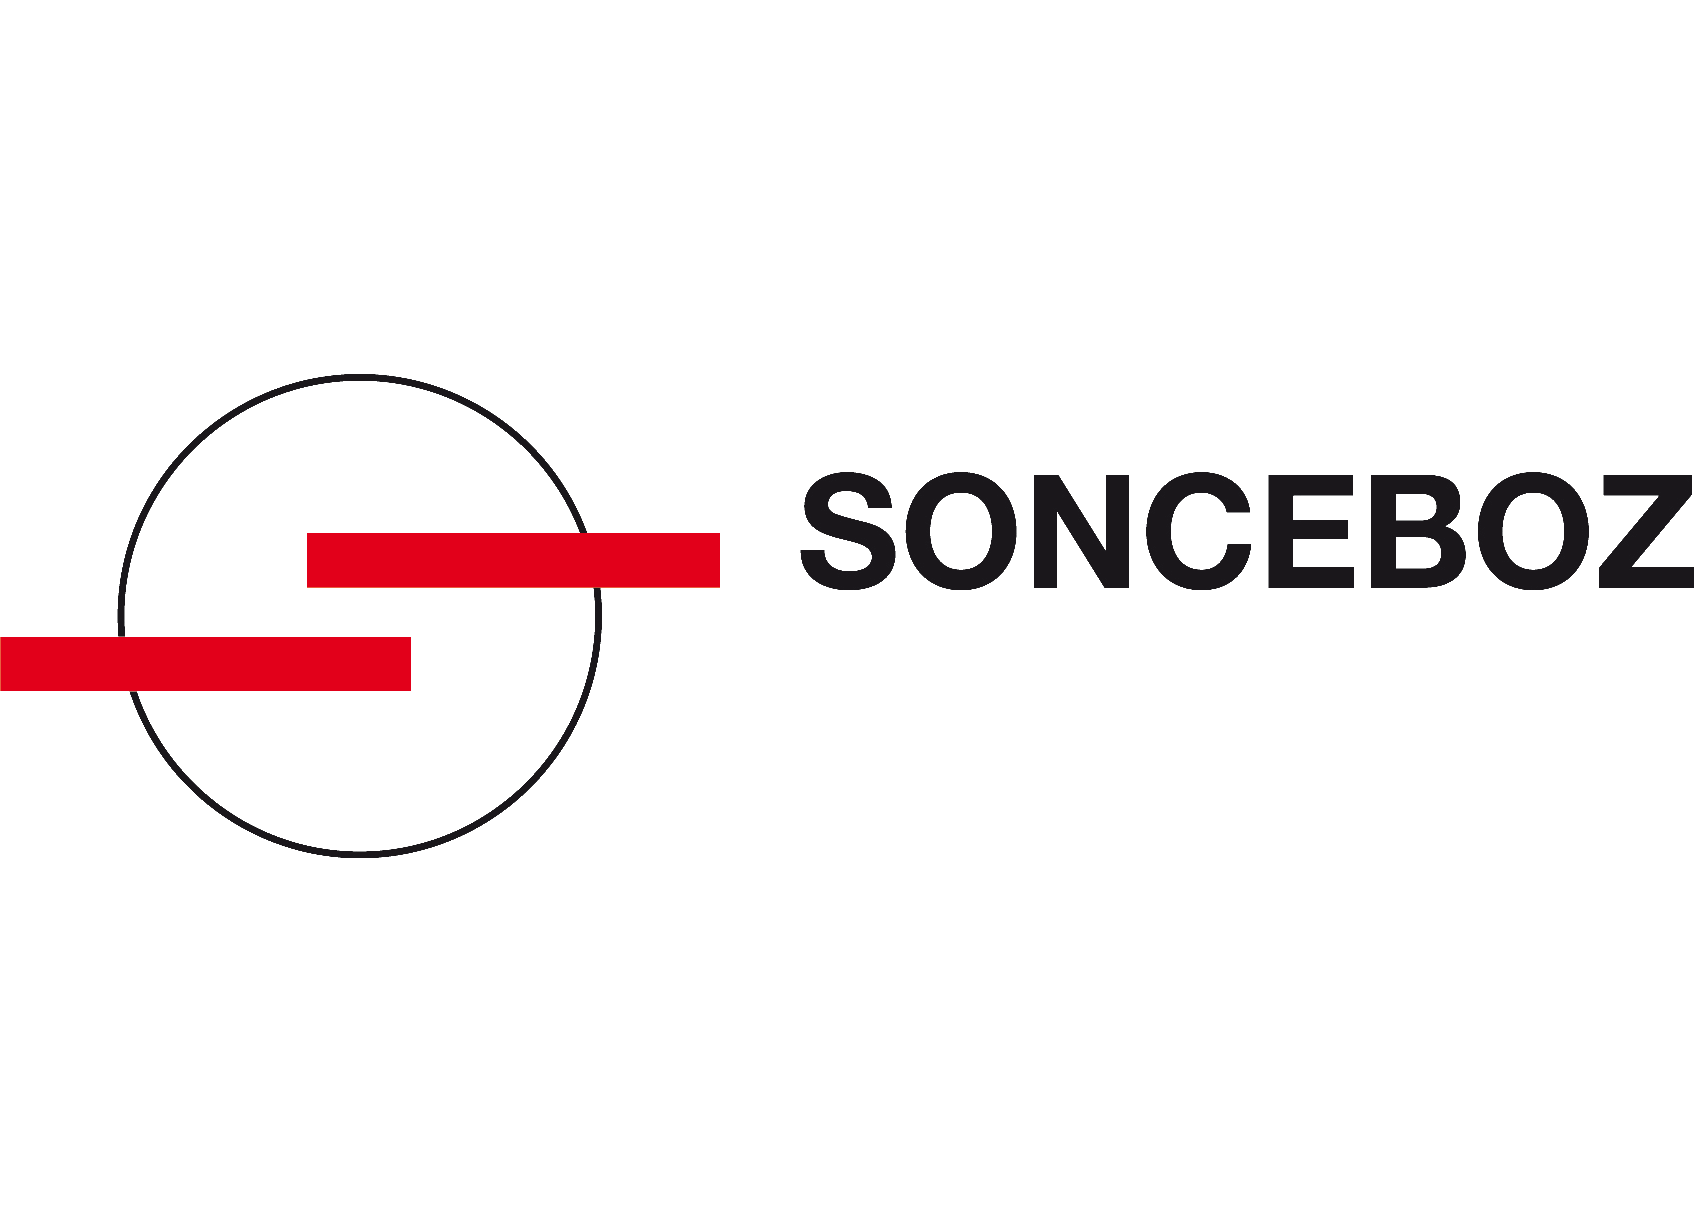 Sonceboz Logo